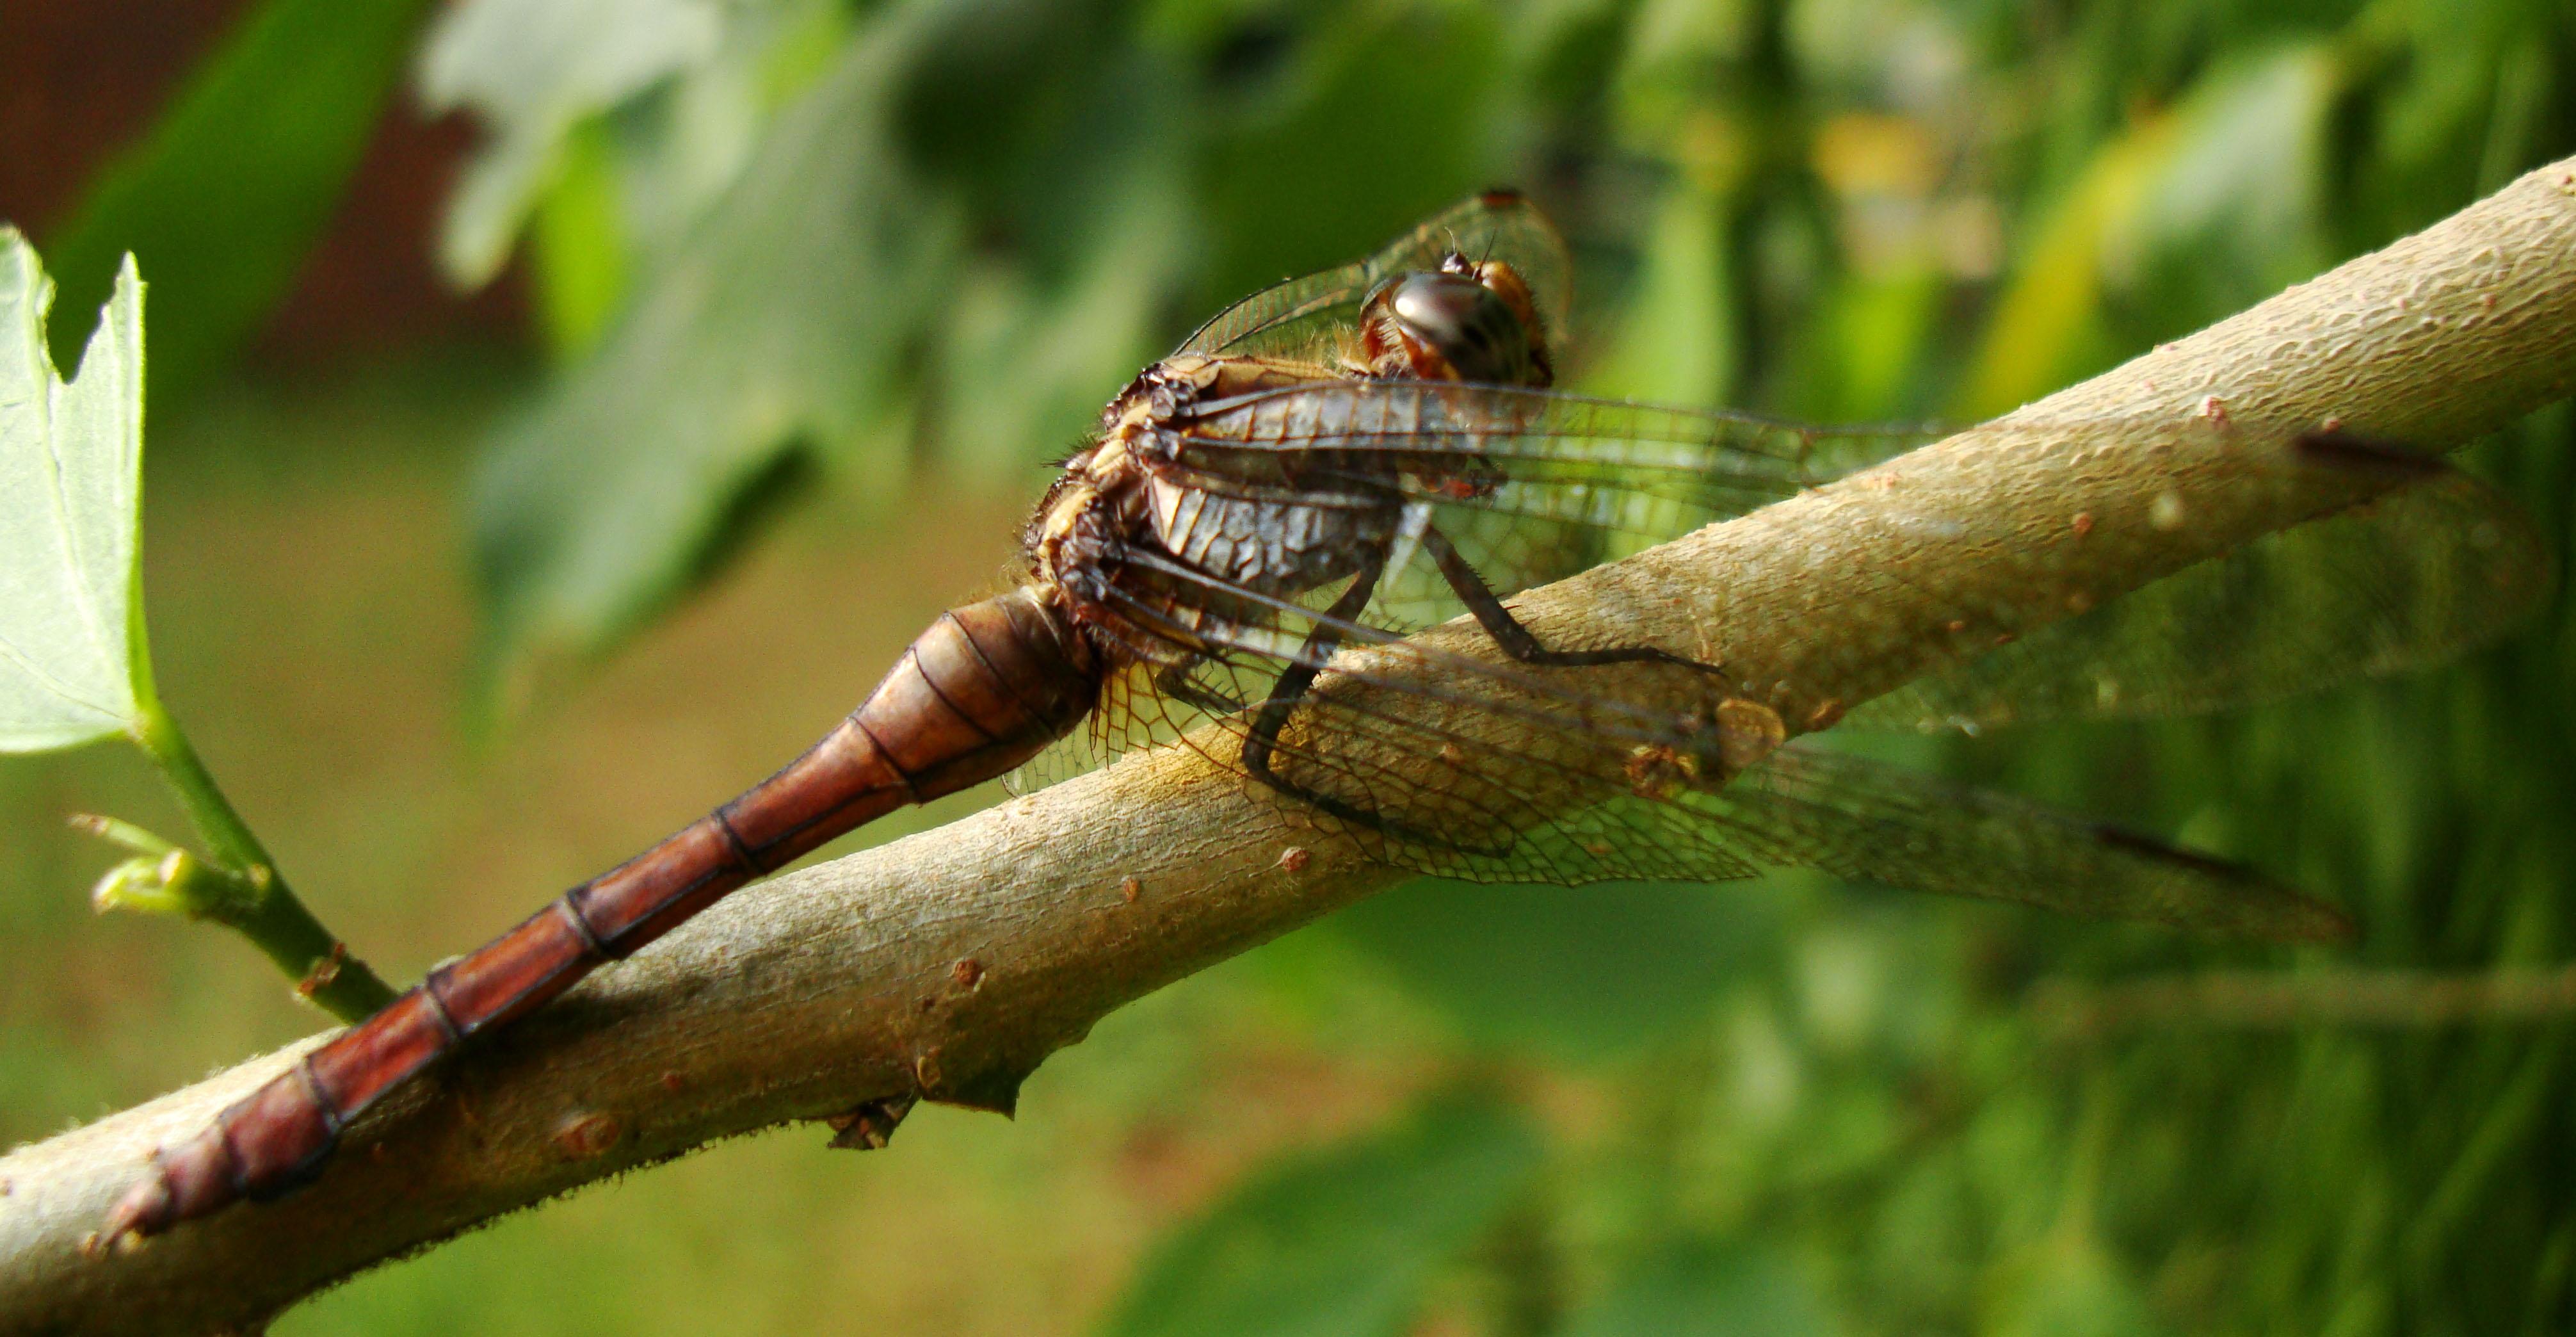 Libellulidae Fiery Skimmer Dragonfly Orthetrum villosovittatum female 10